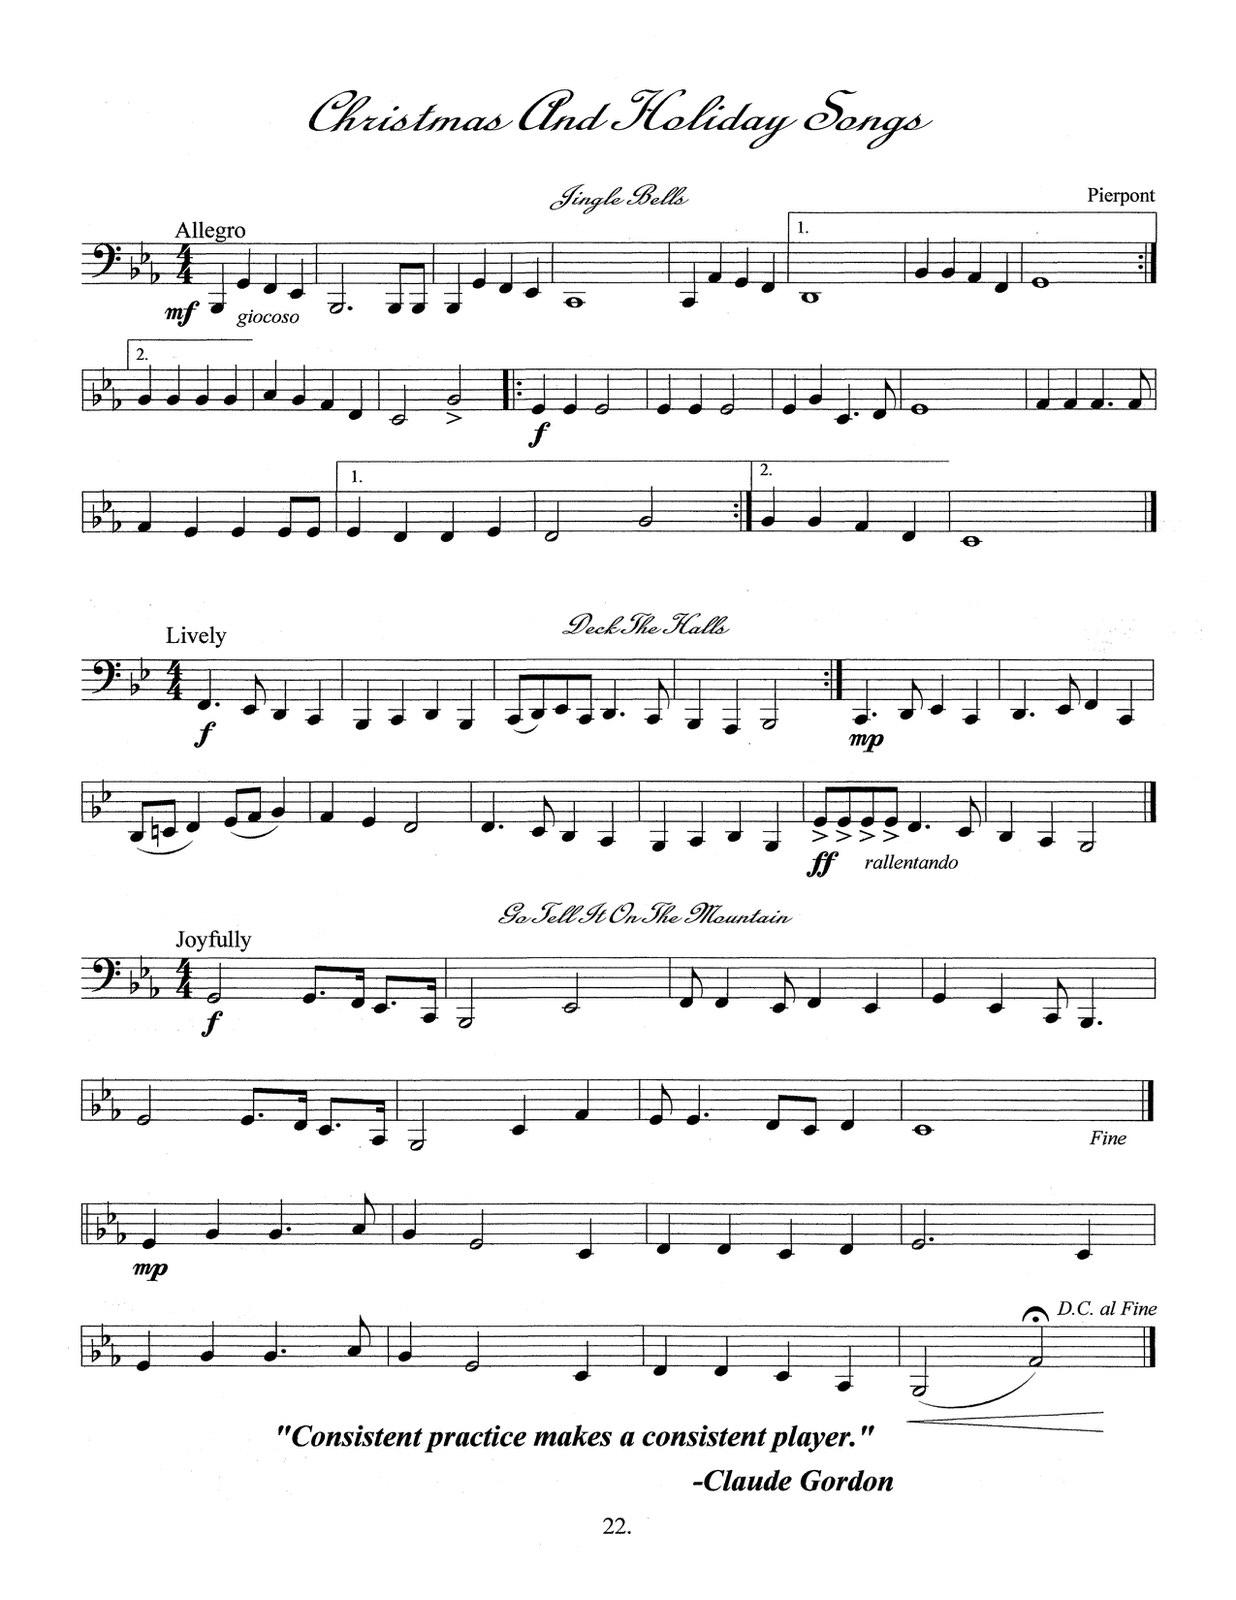 Bolvin, Really Big Tuba Songbook-p32